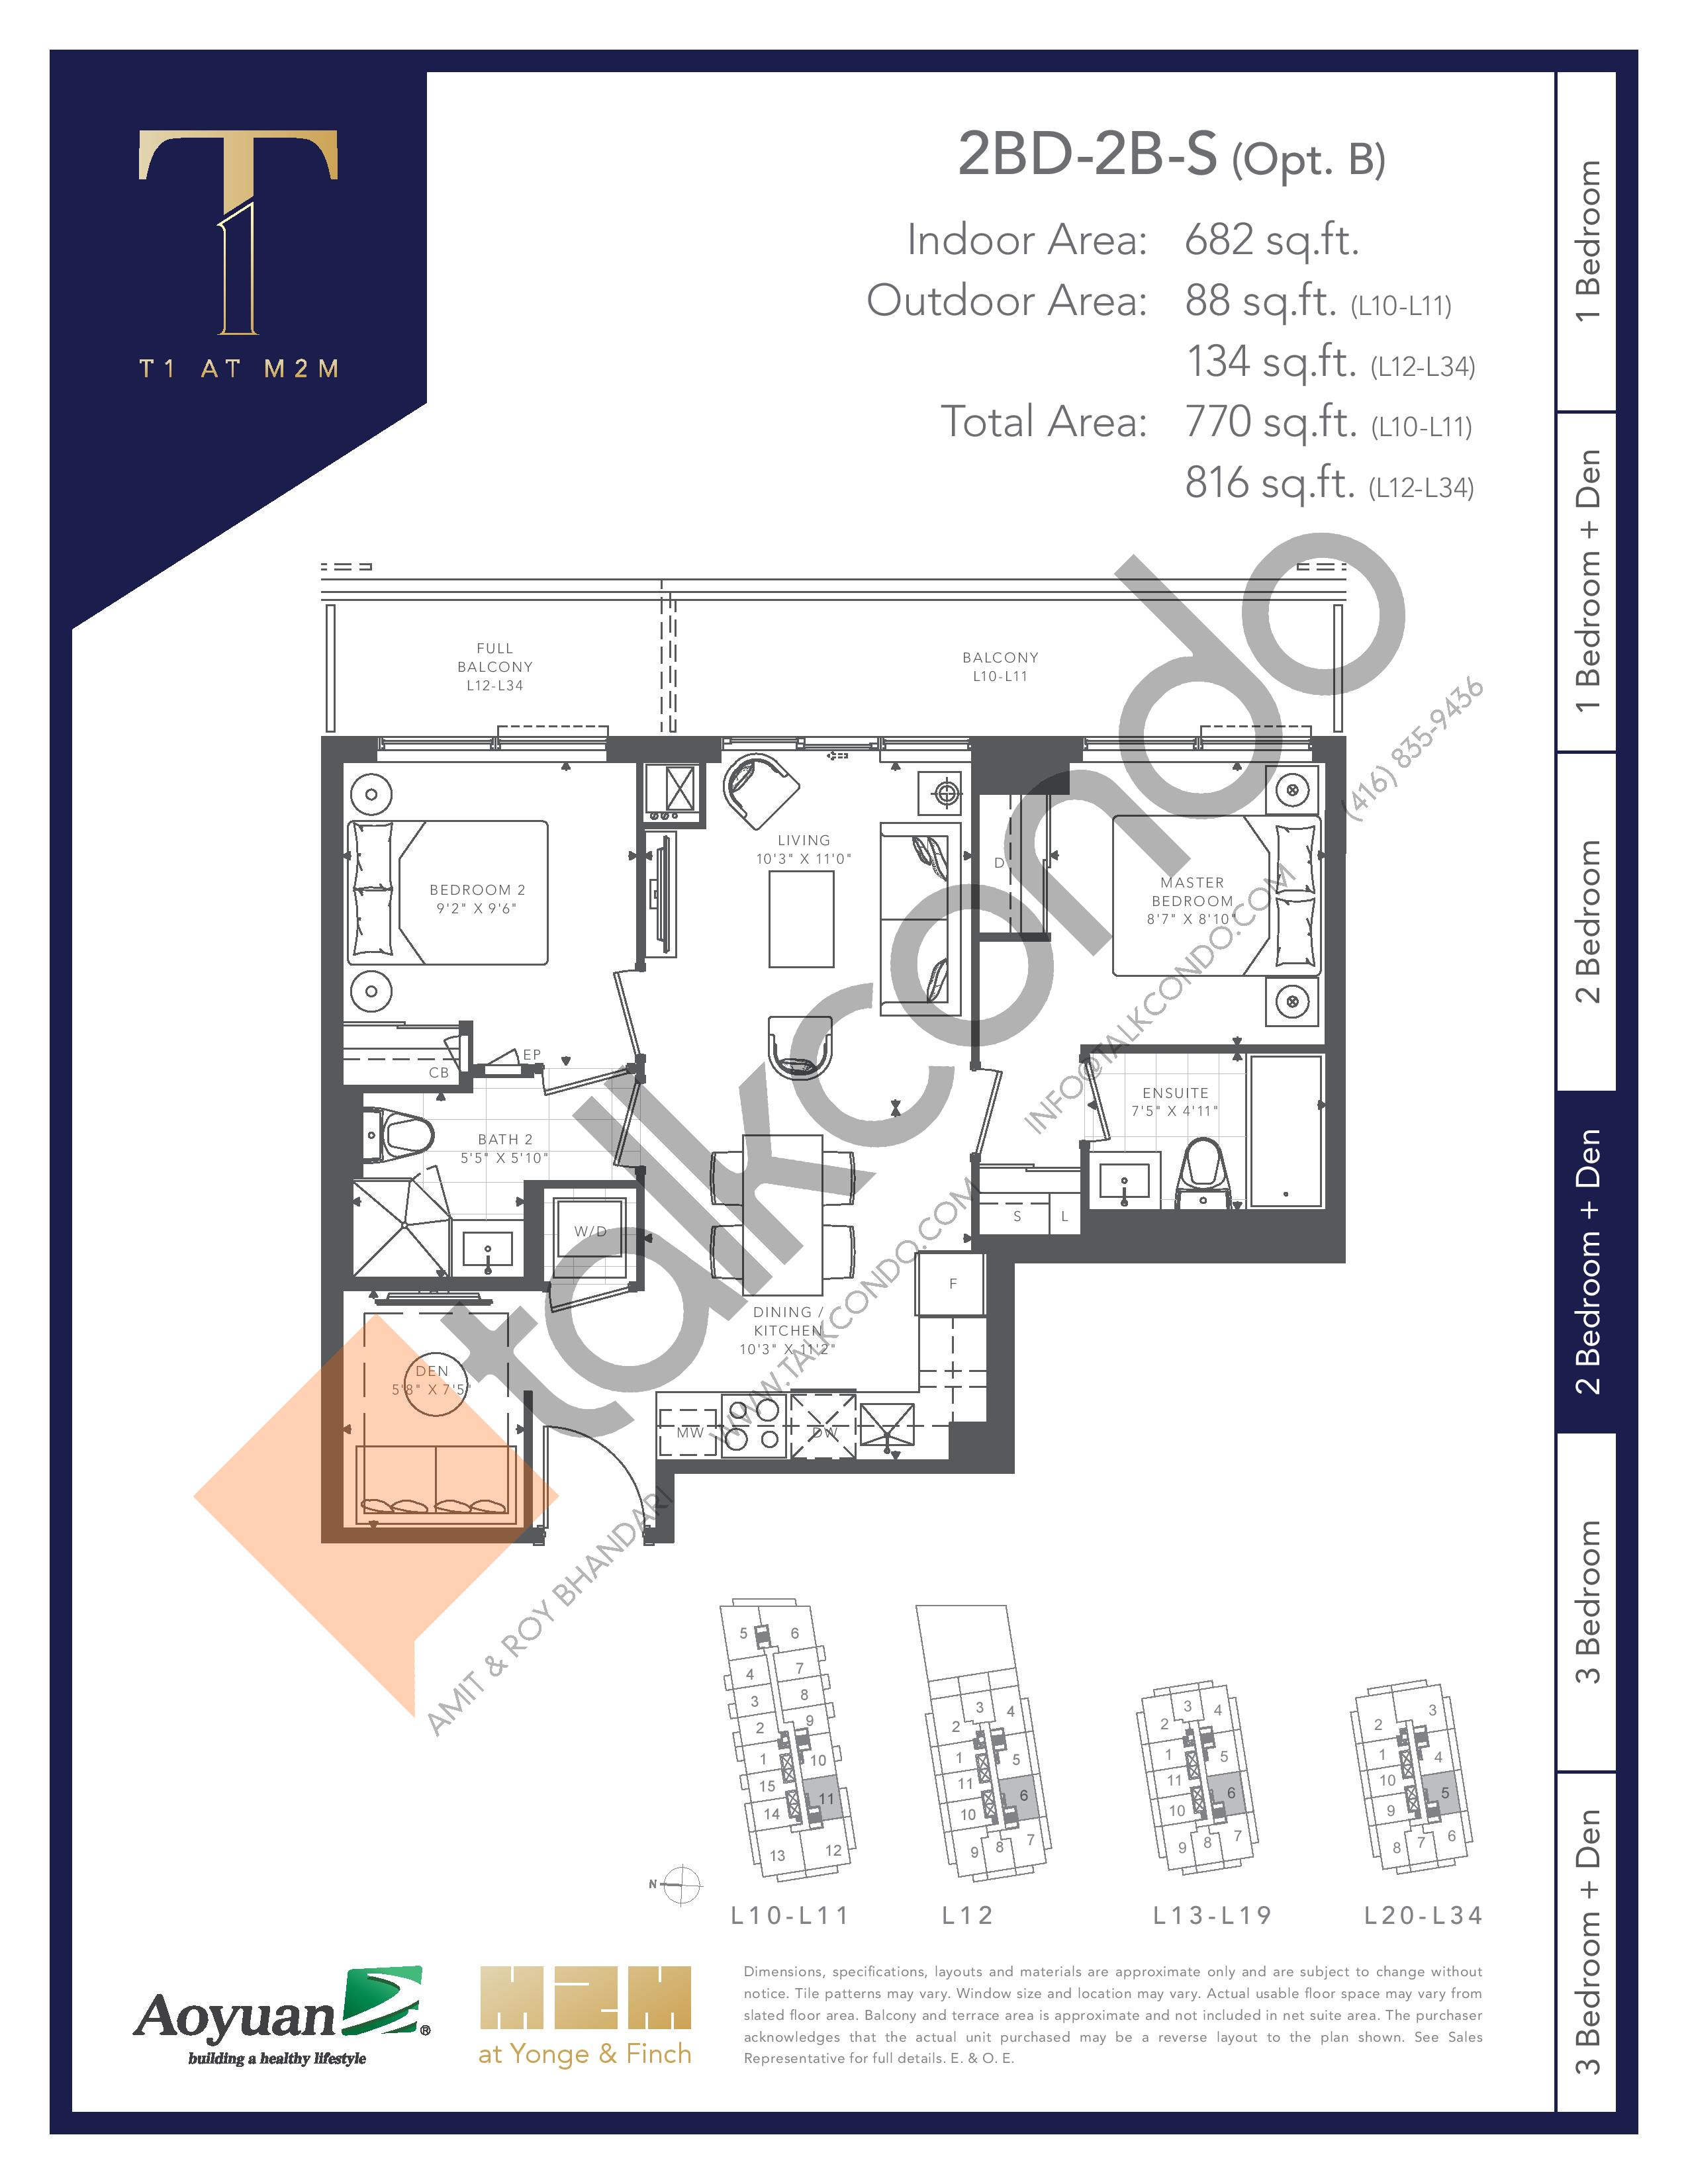 2BD-2B-S (Opt. B) Floor Plan at T1 at M2M Condos - 682 sq.ft